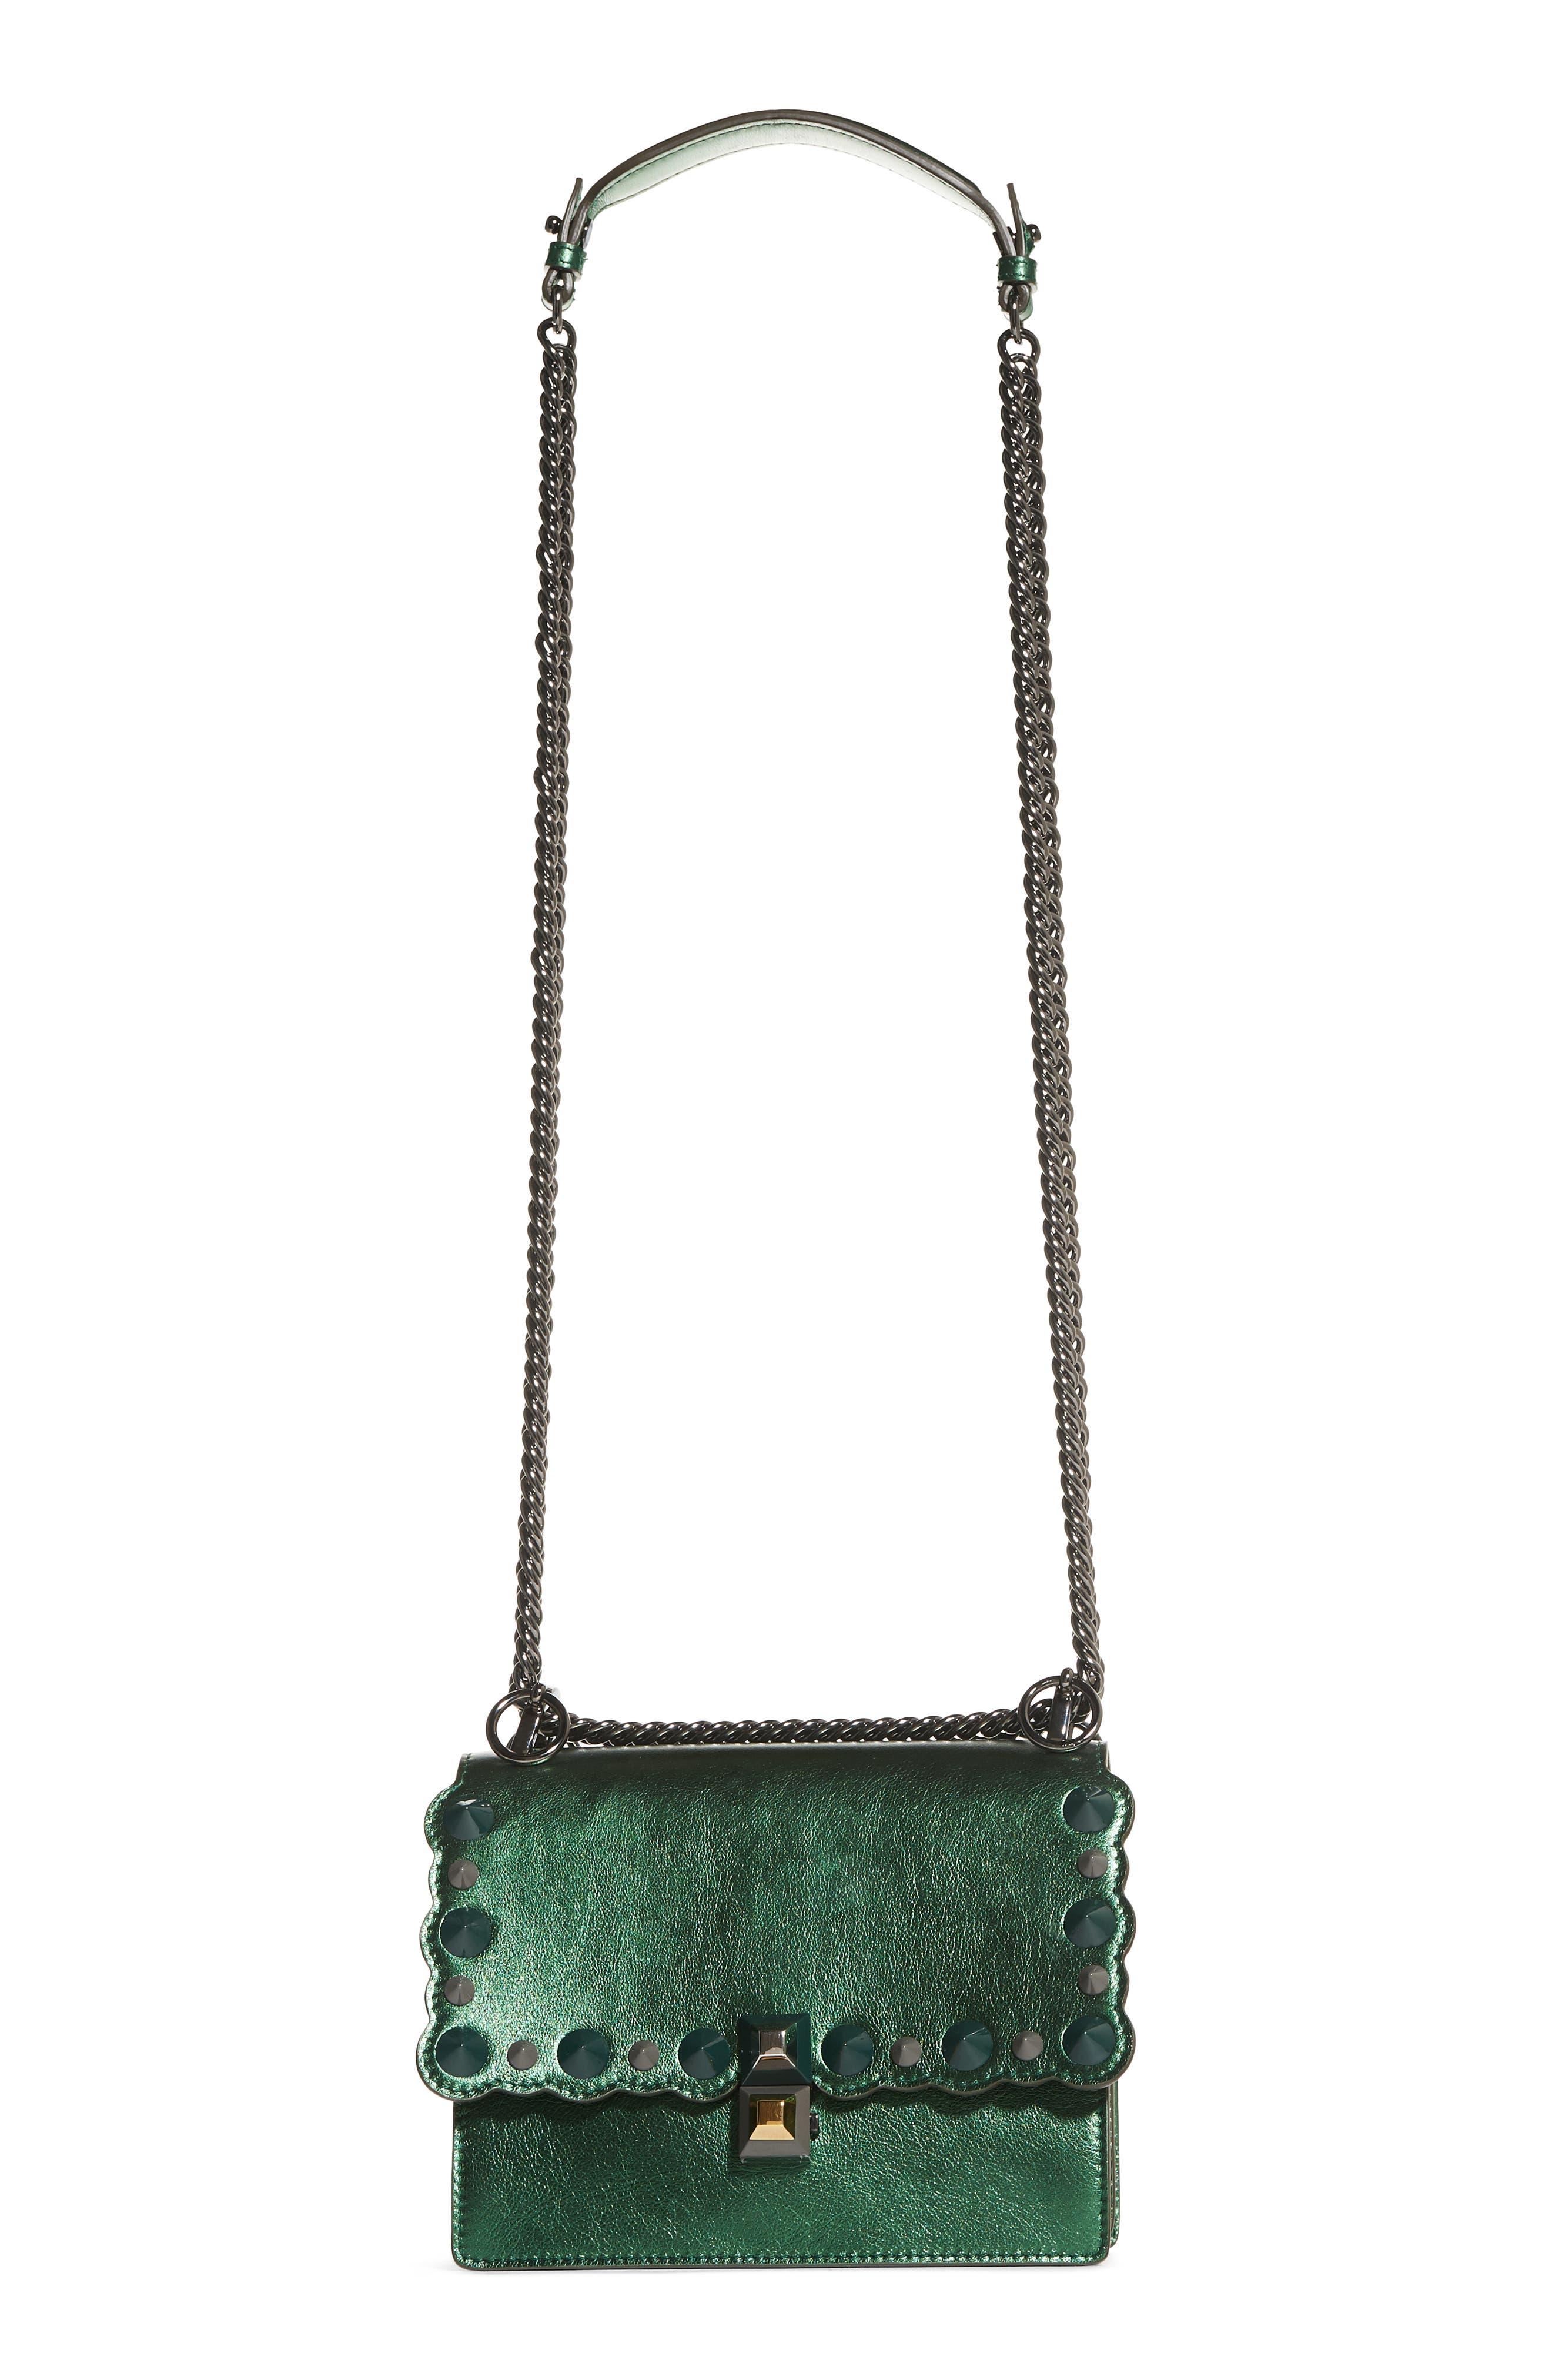 Main Image - Fendi Small Kan I Metallic Leather Shoulder Bag